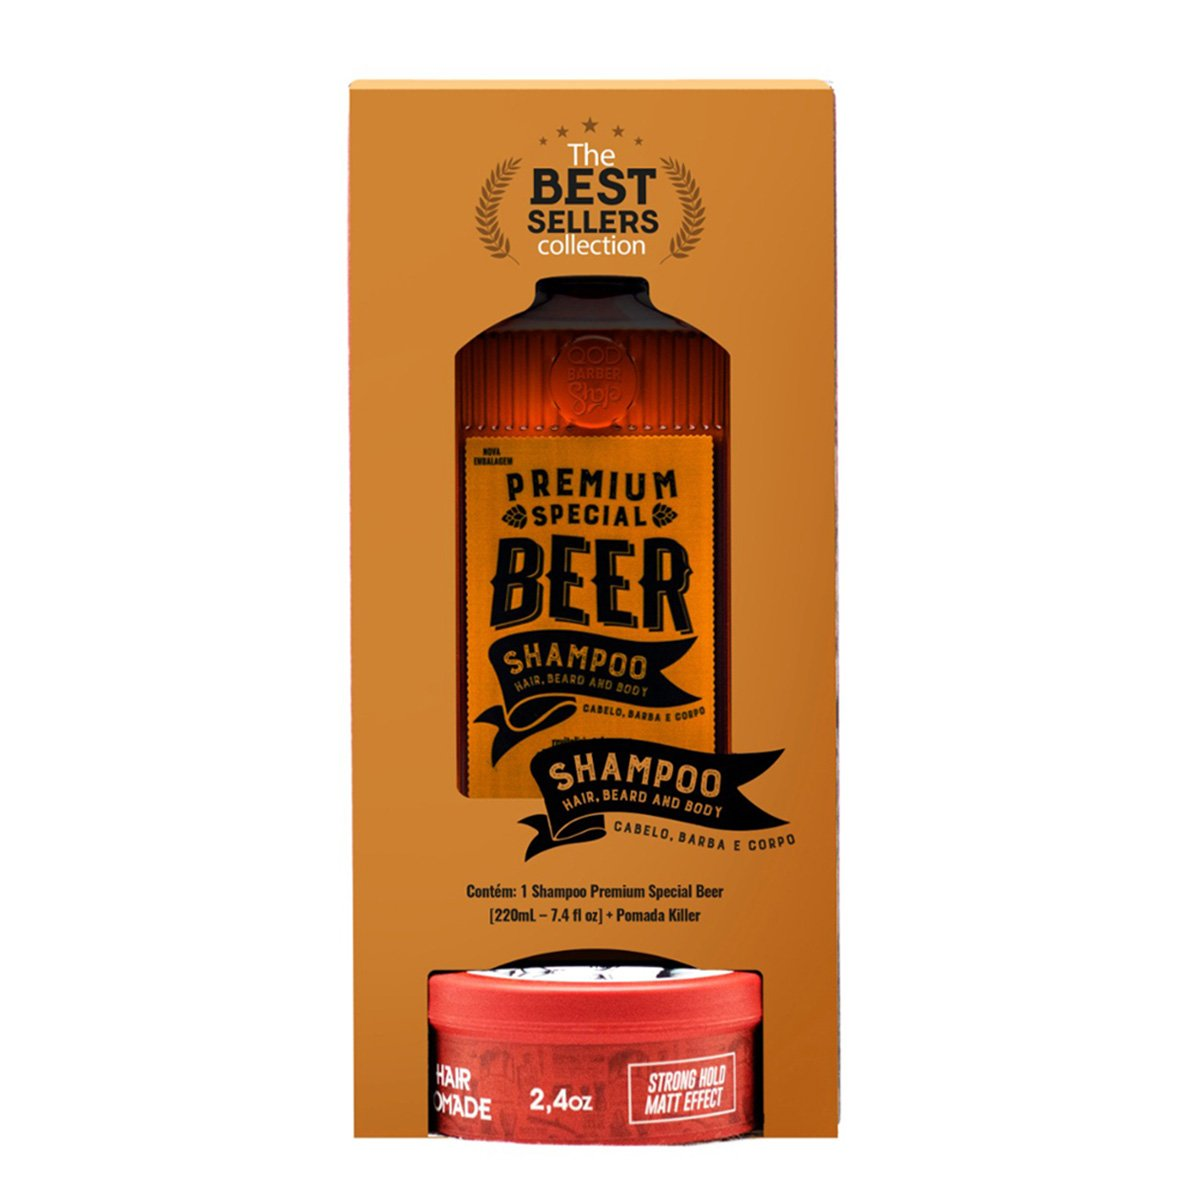 Kit QBS Shampoo Premium Special Beer 200ml + Pomada de Cabelo Killer